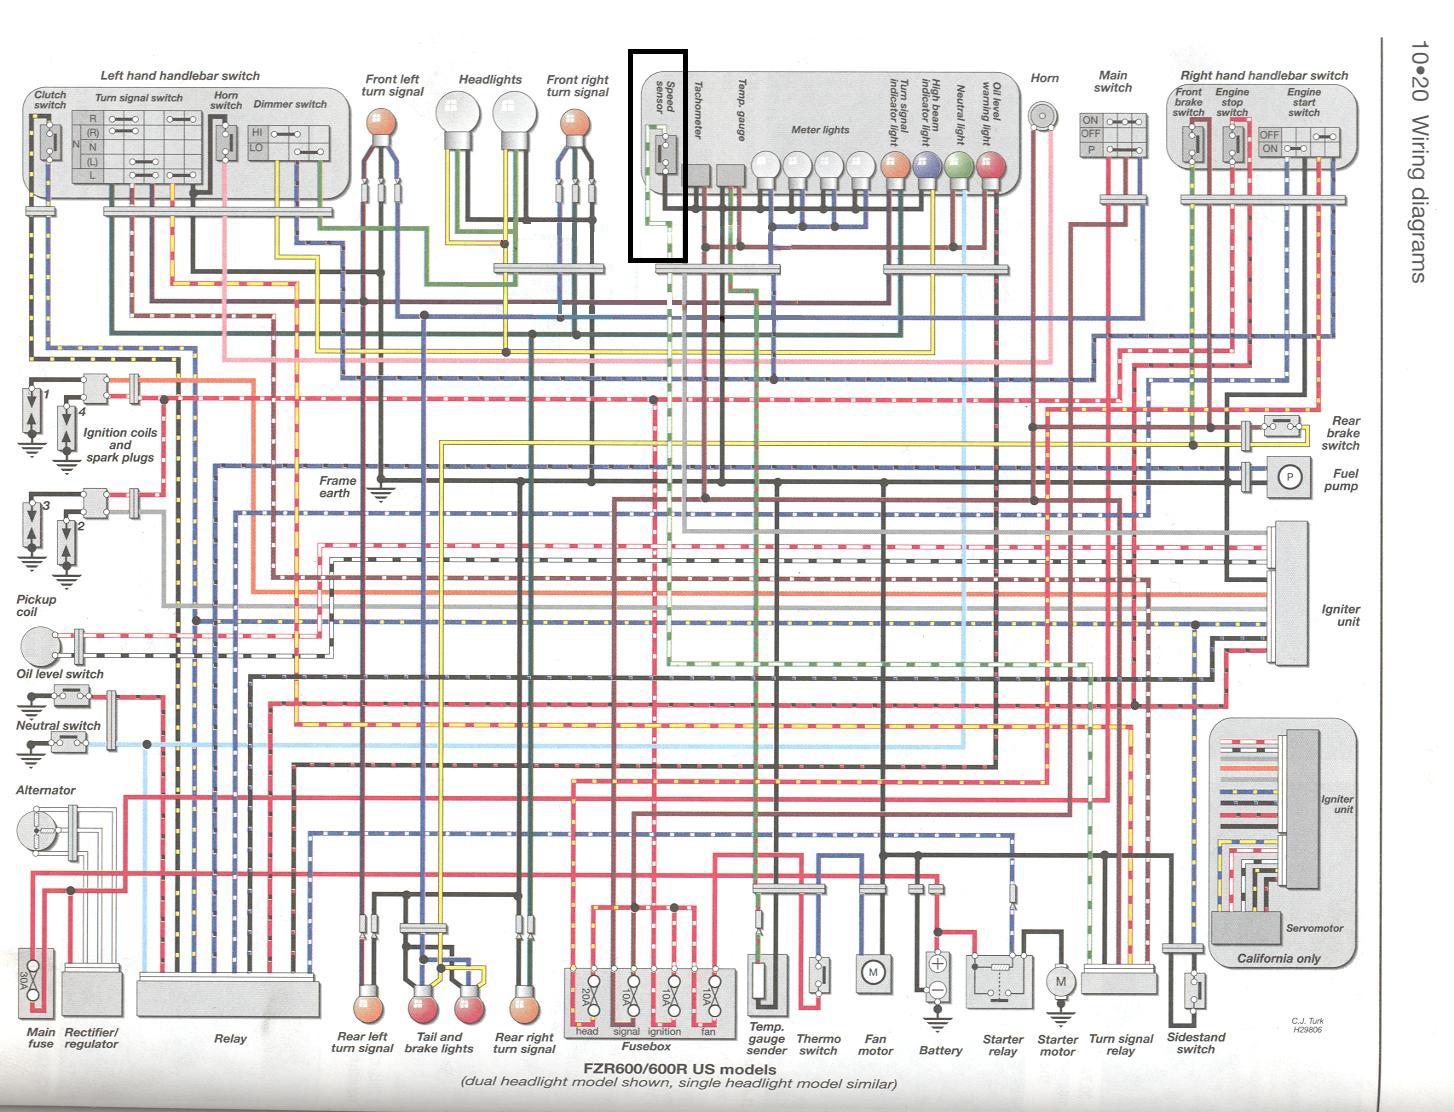 2002 Gsxr 600 Wiring Diagram: Excellent 2002 Gsxr 1000 Wiring Diagram  Gallery - Electrical ,